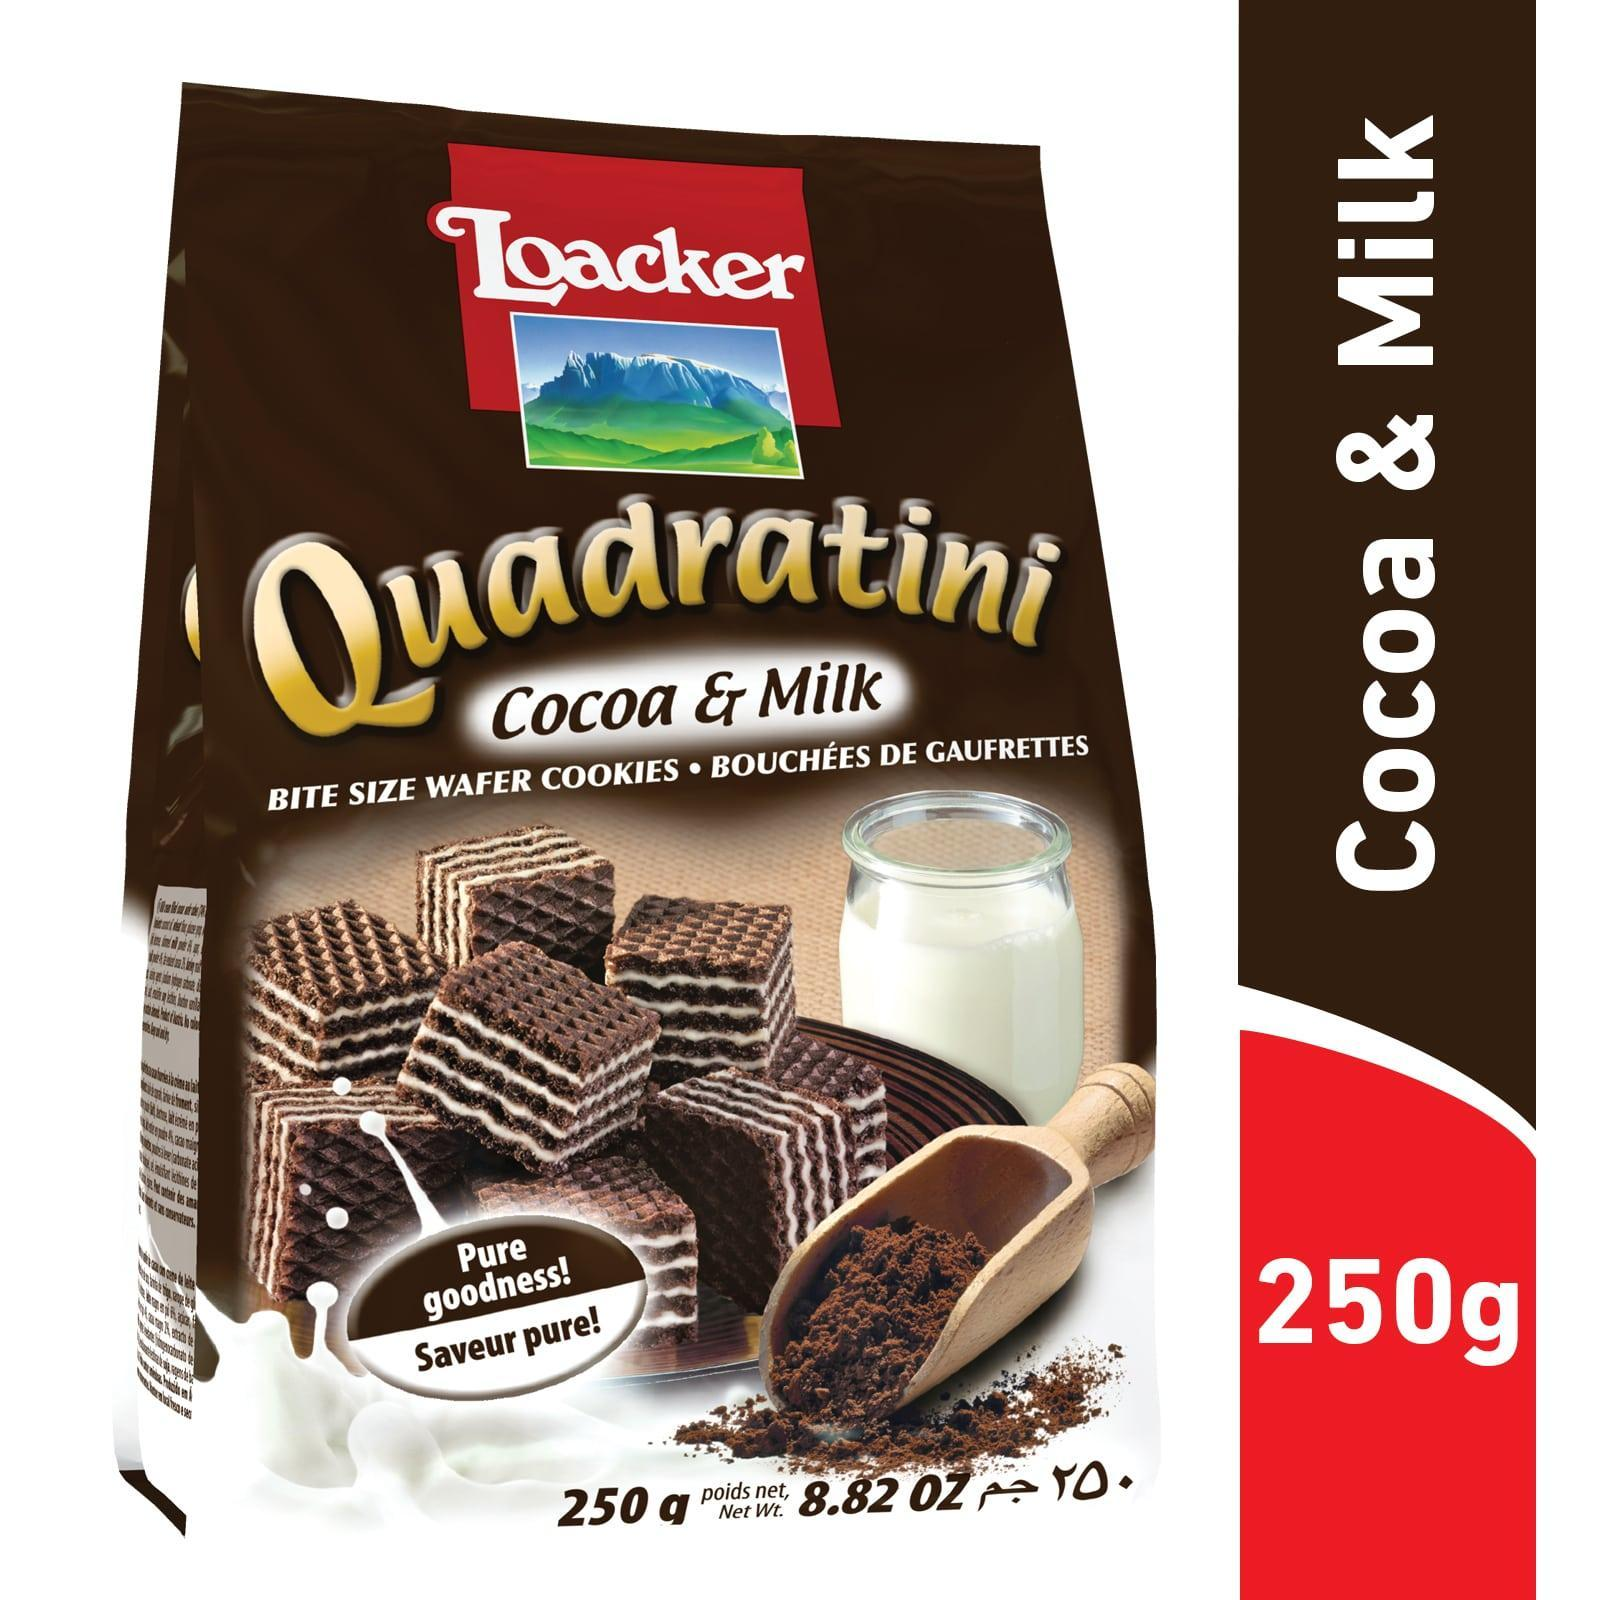 Loacker Quadratini Cocoa And Milk Wafer Cookies